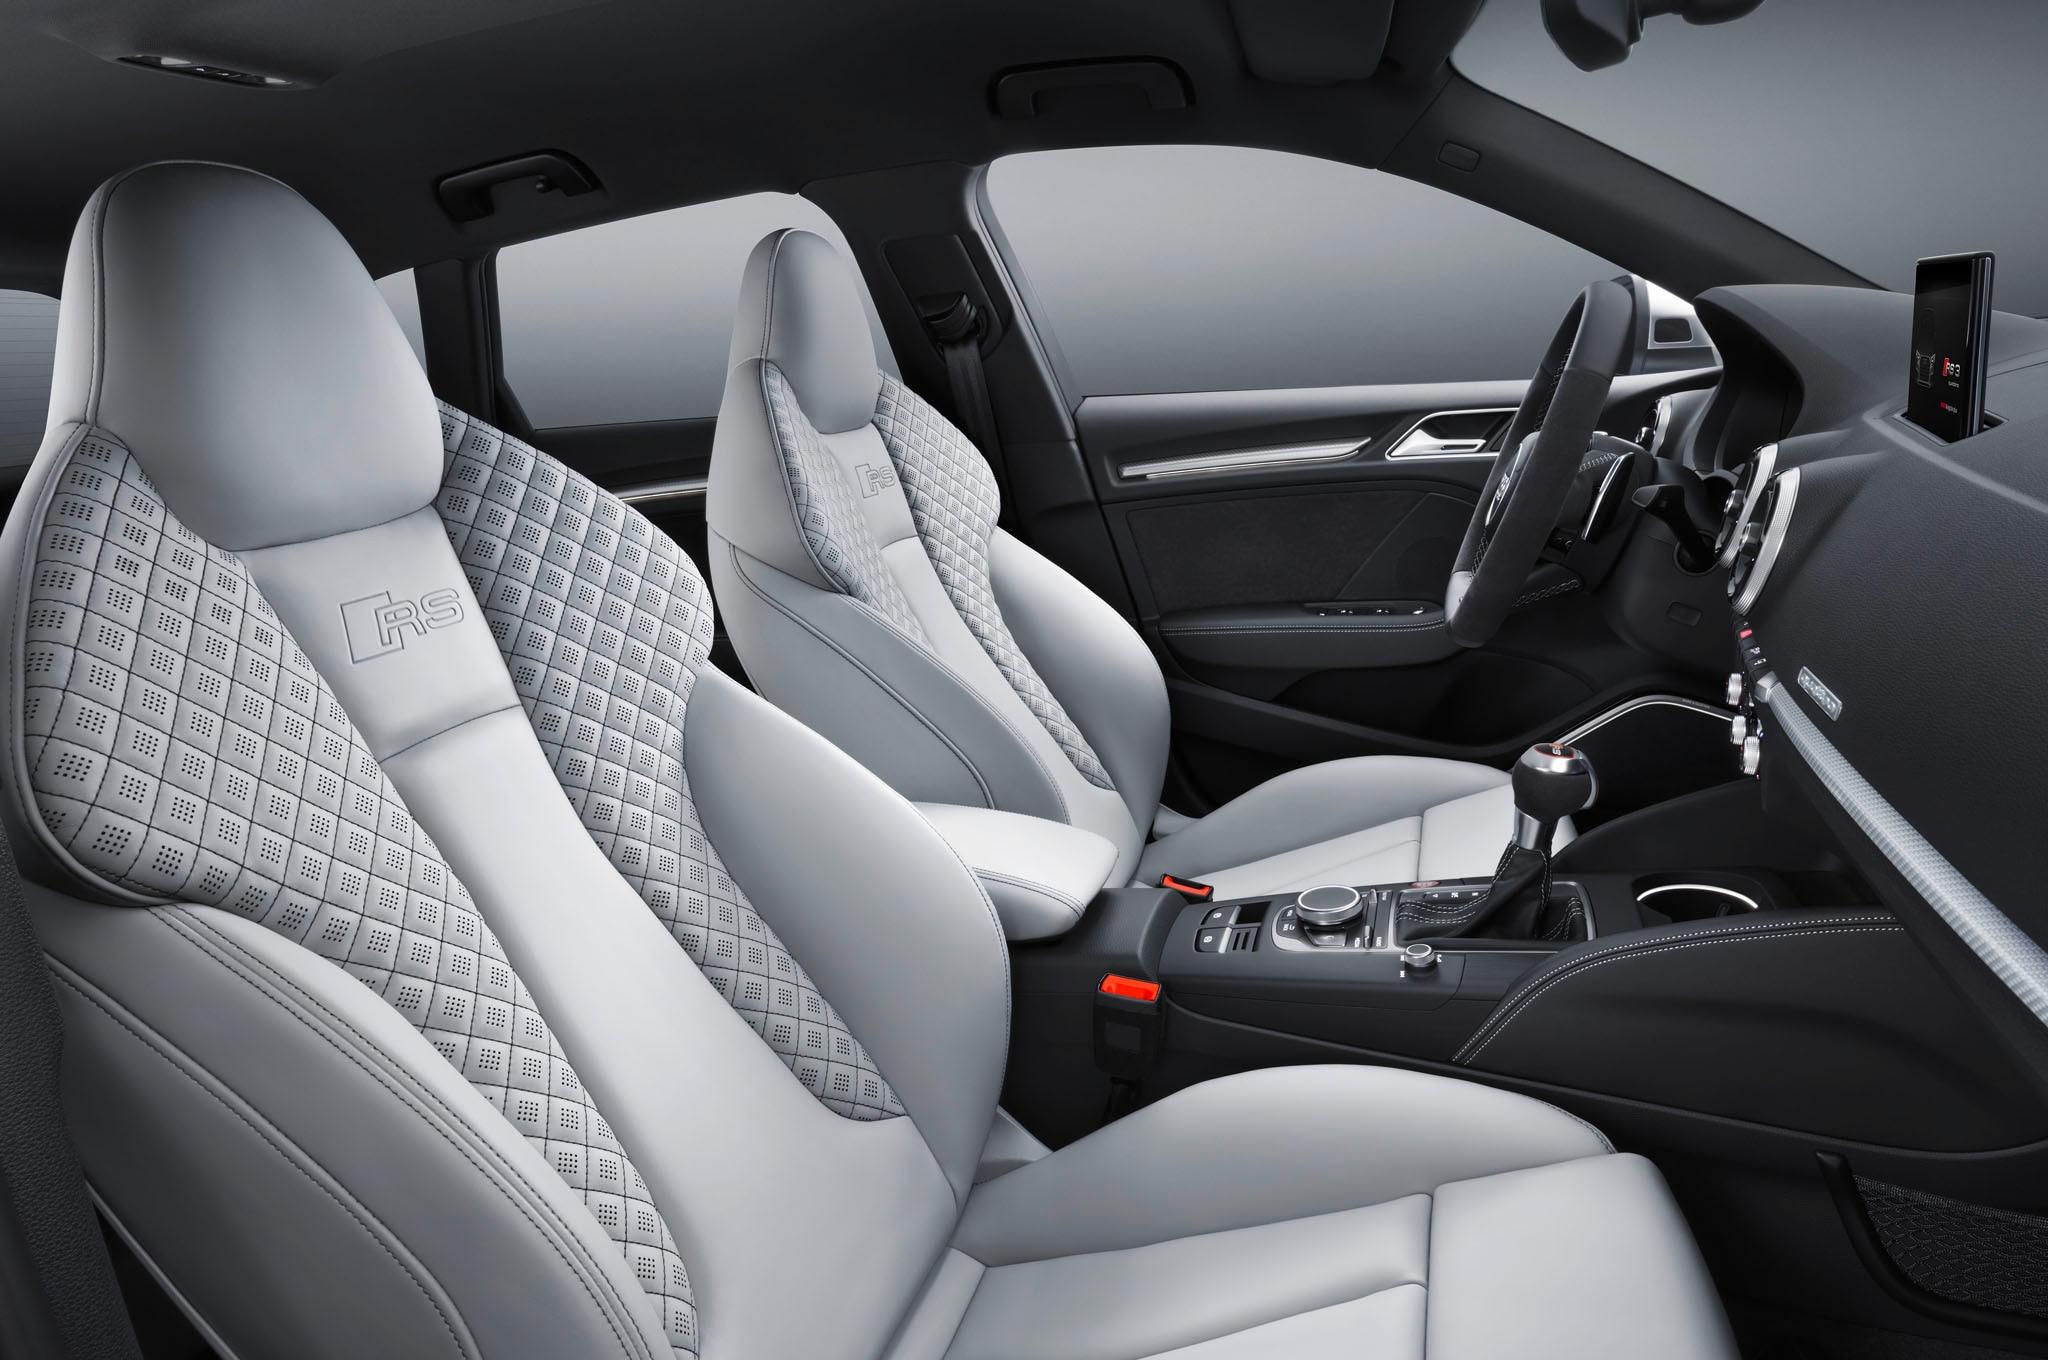 Audi RS 3 Sportback Seats